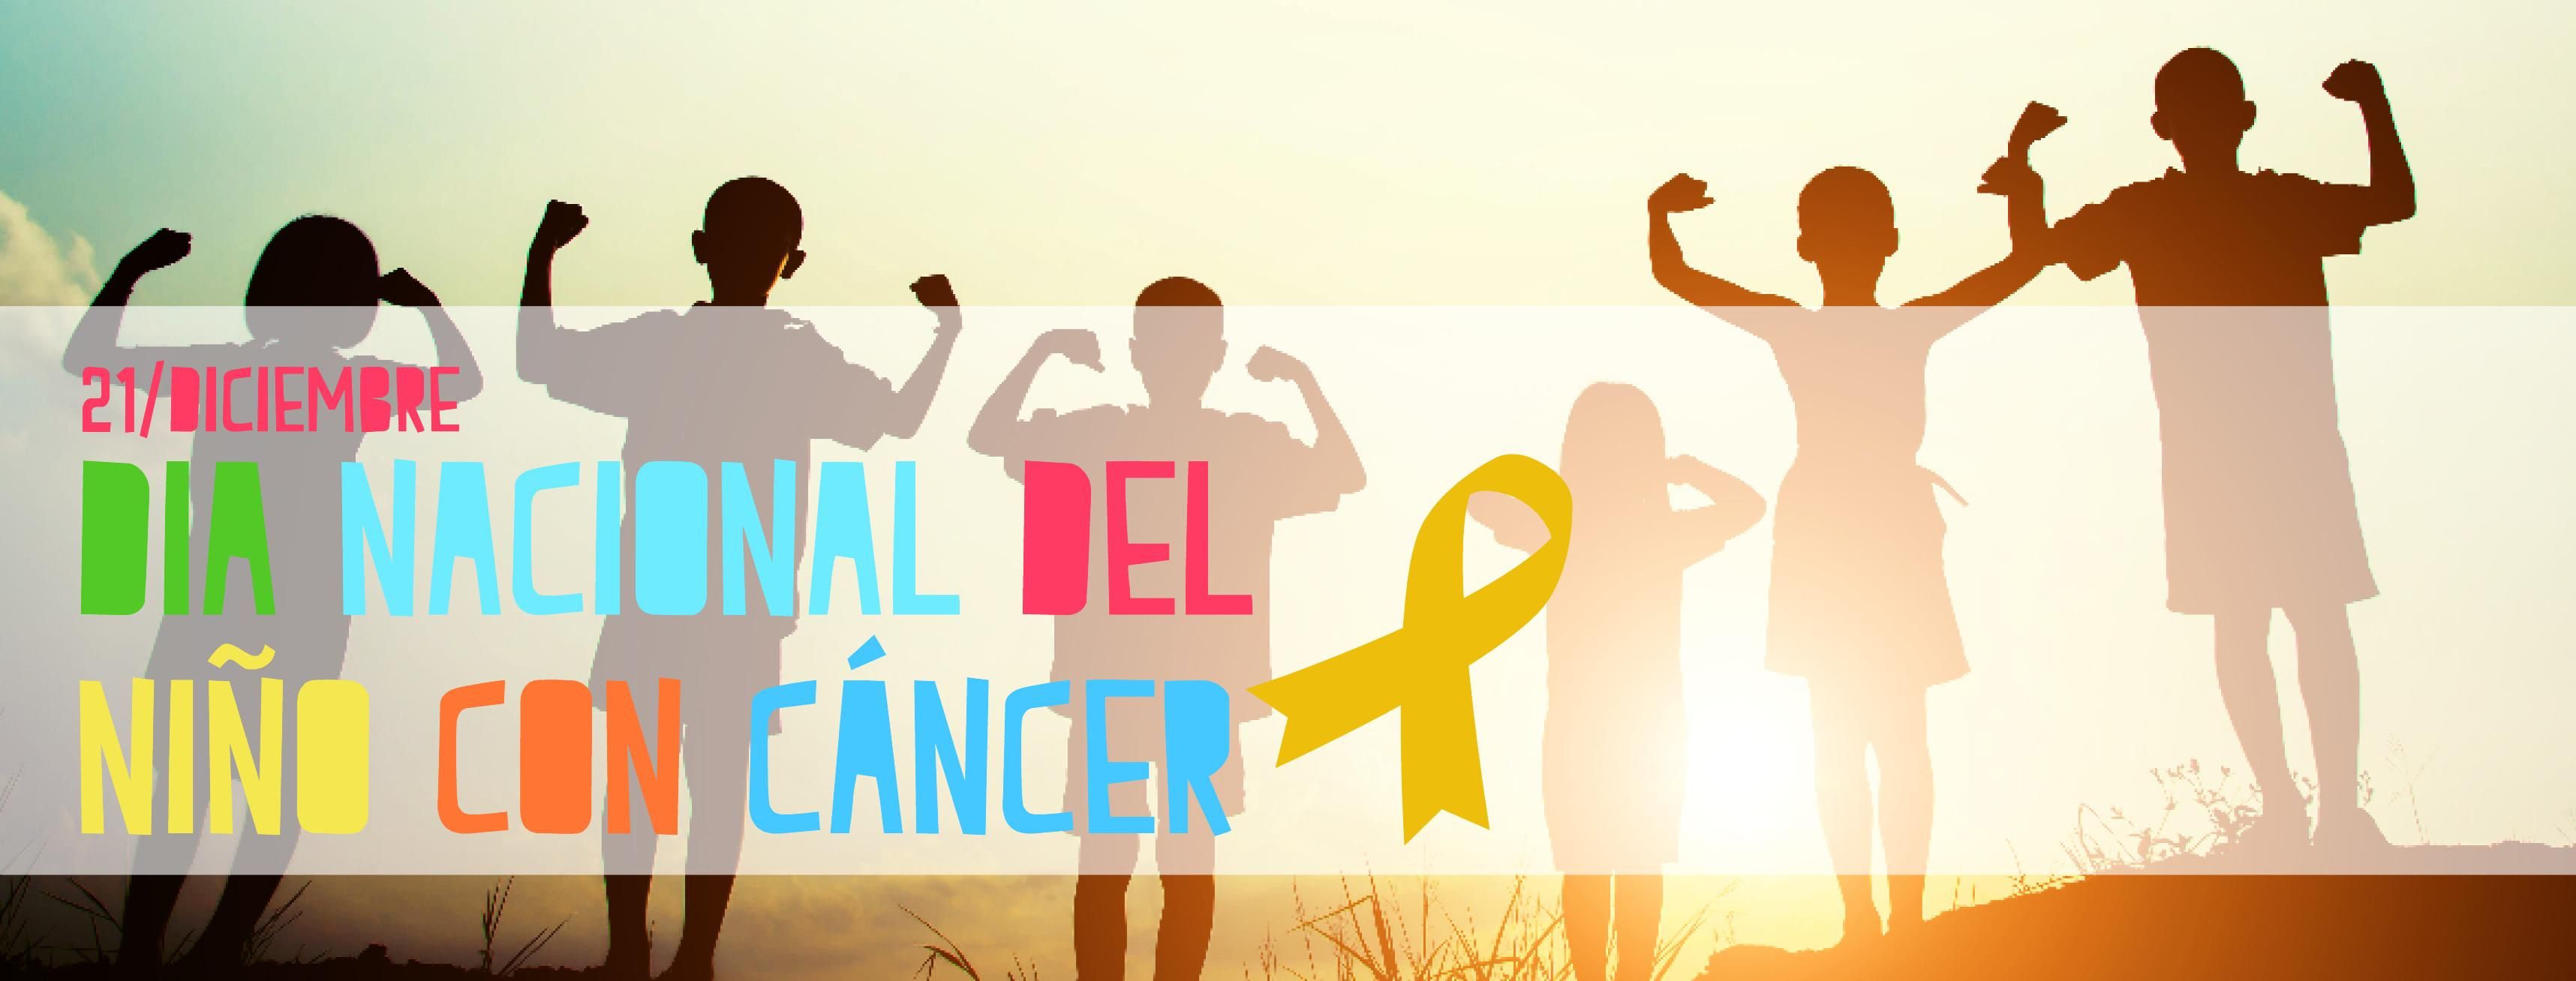 cabecera-nino-con-cancer-2016-rrss